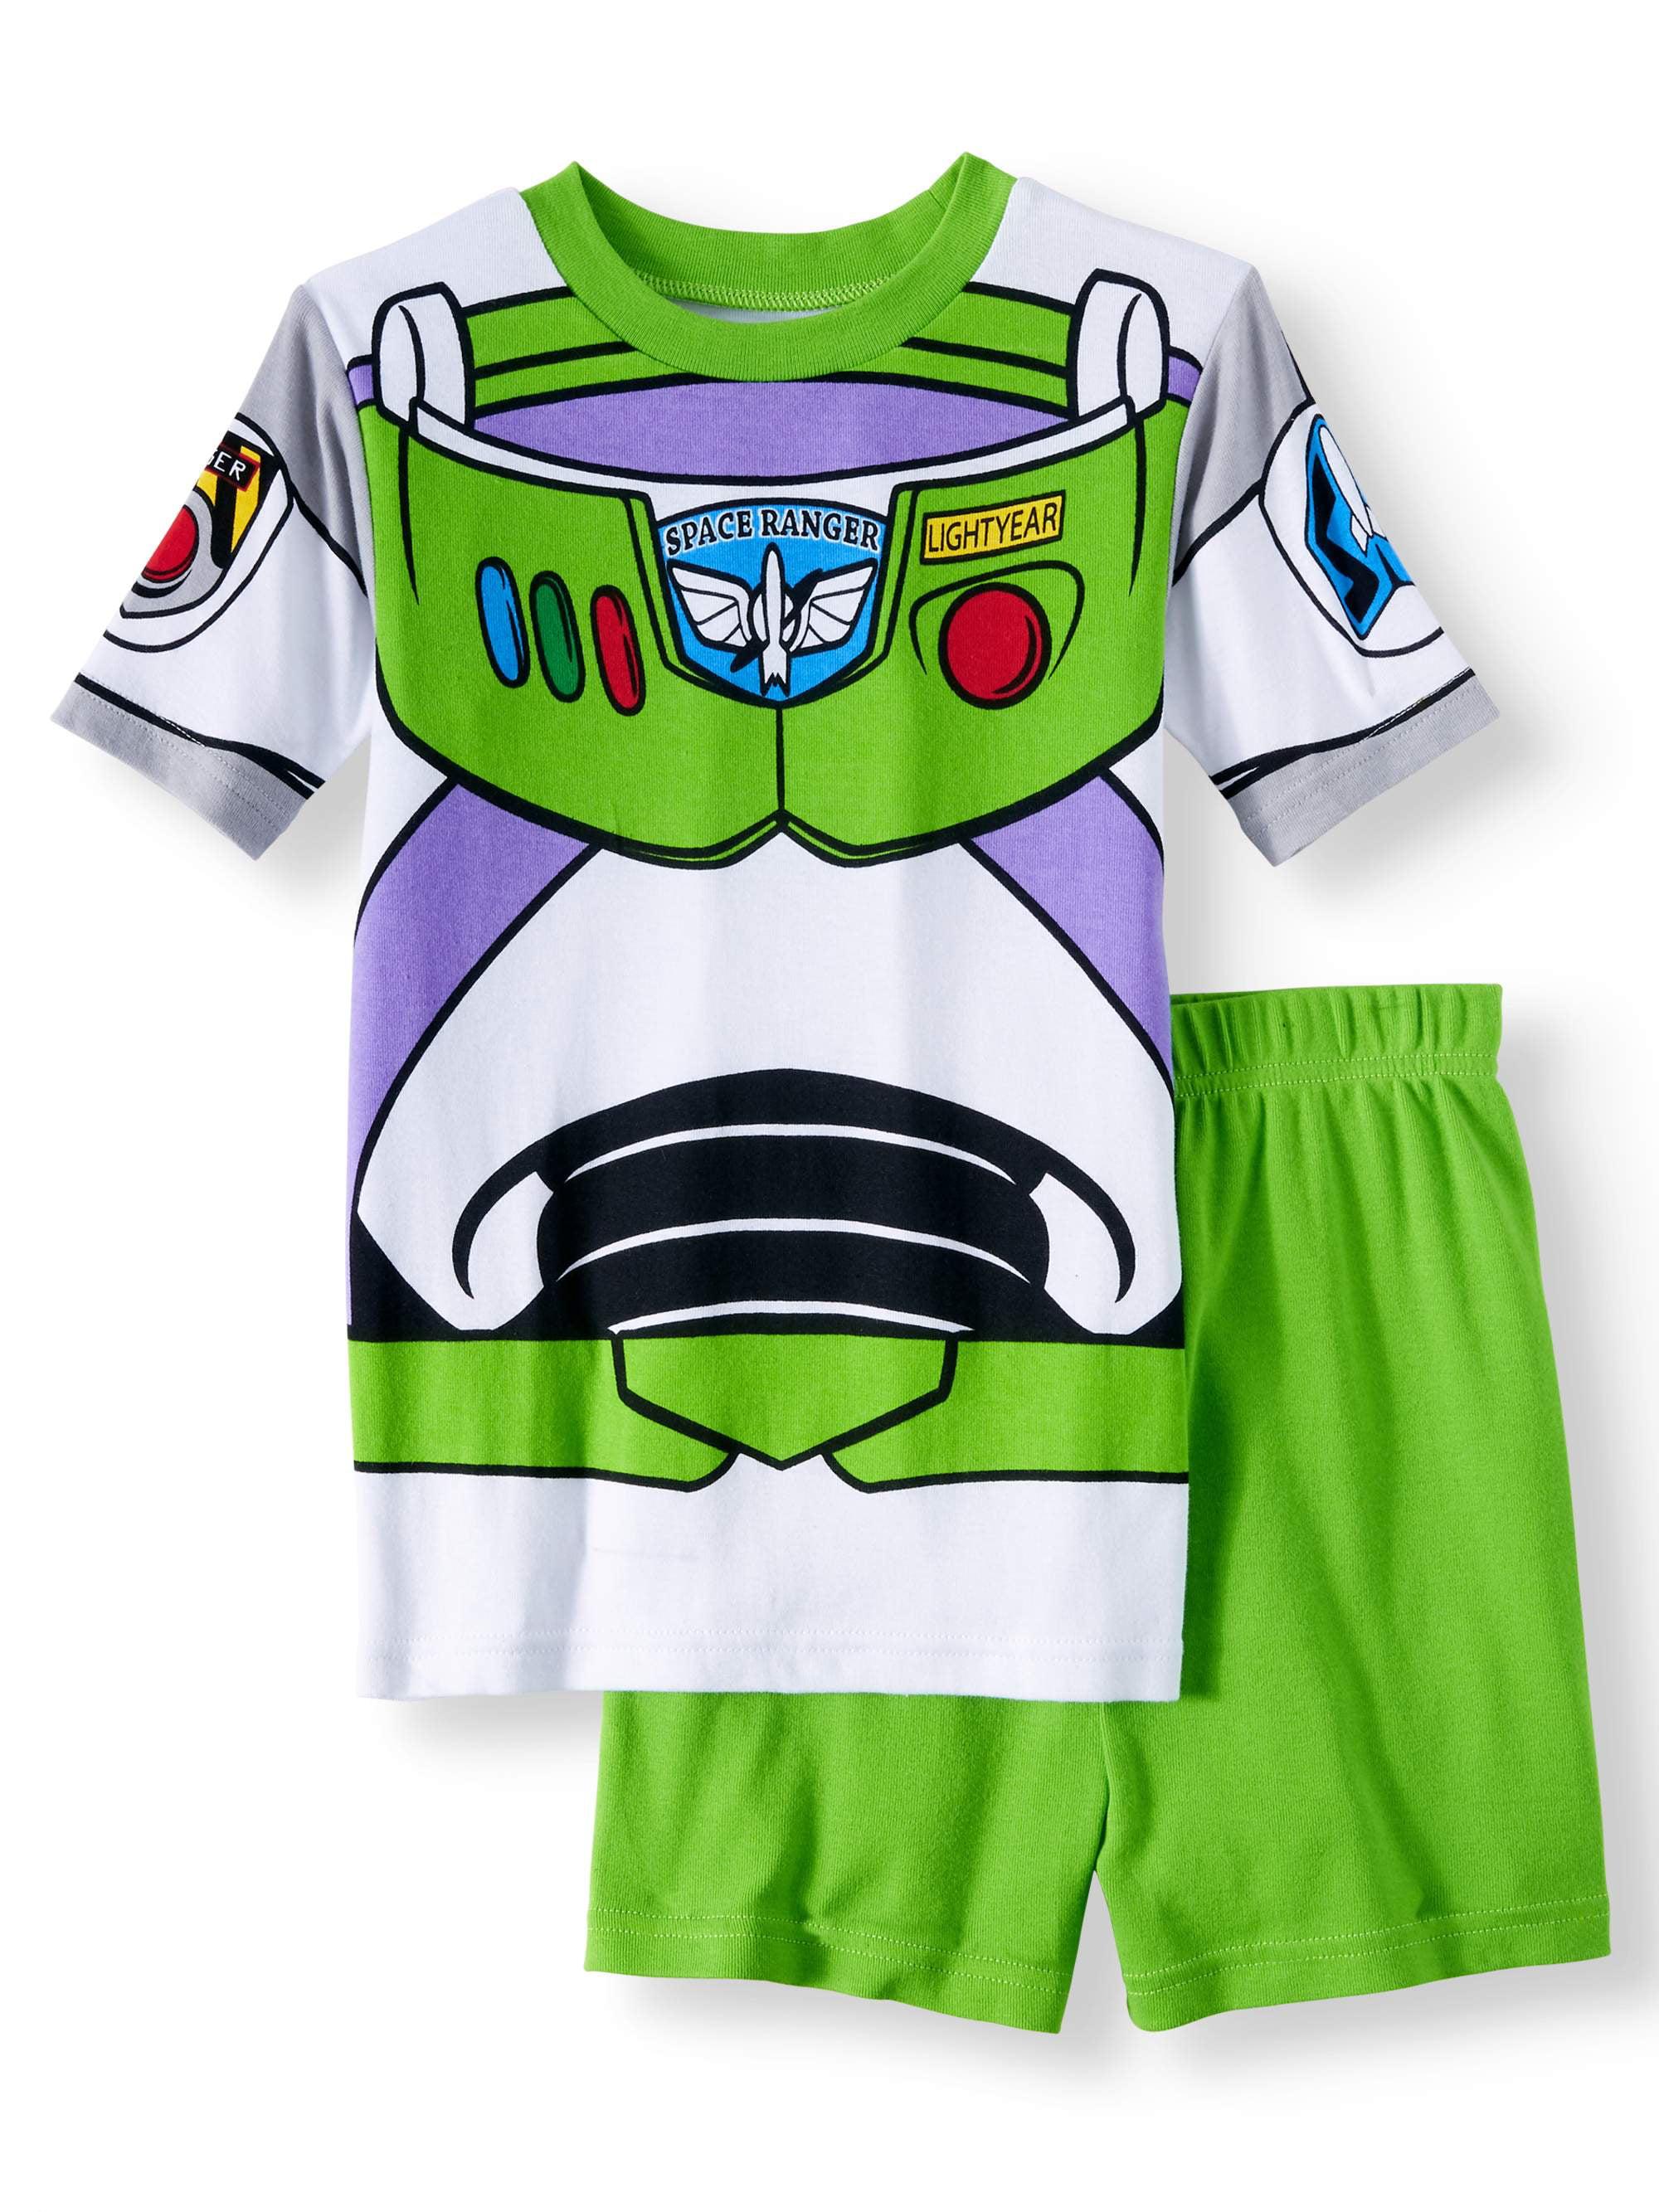 3332085cc Toy Story - Toy Story Boys' Cotton 2-Piece Pajama Sleep Set - Walmart.com